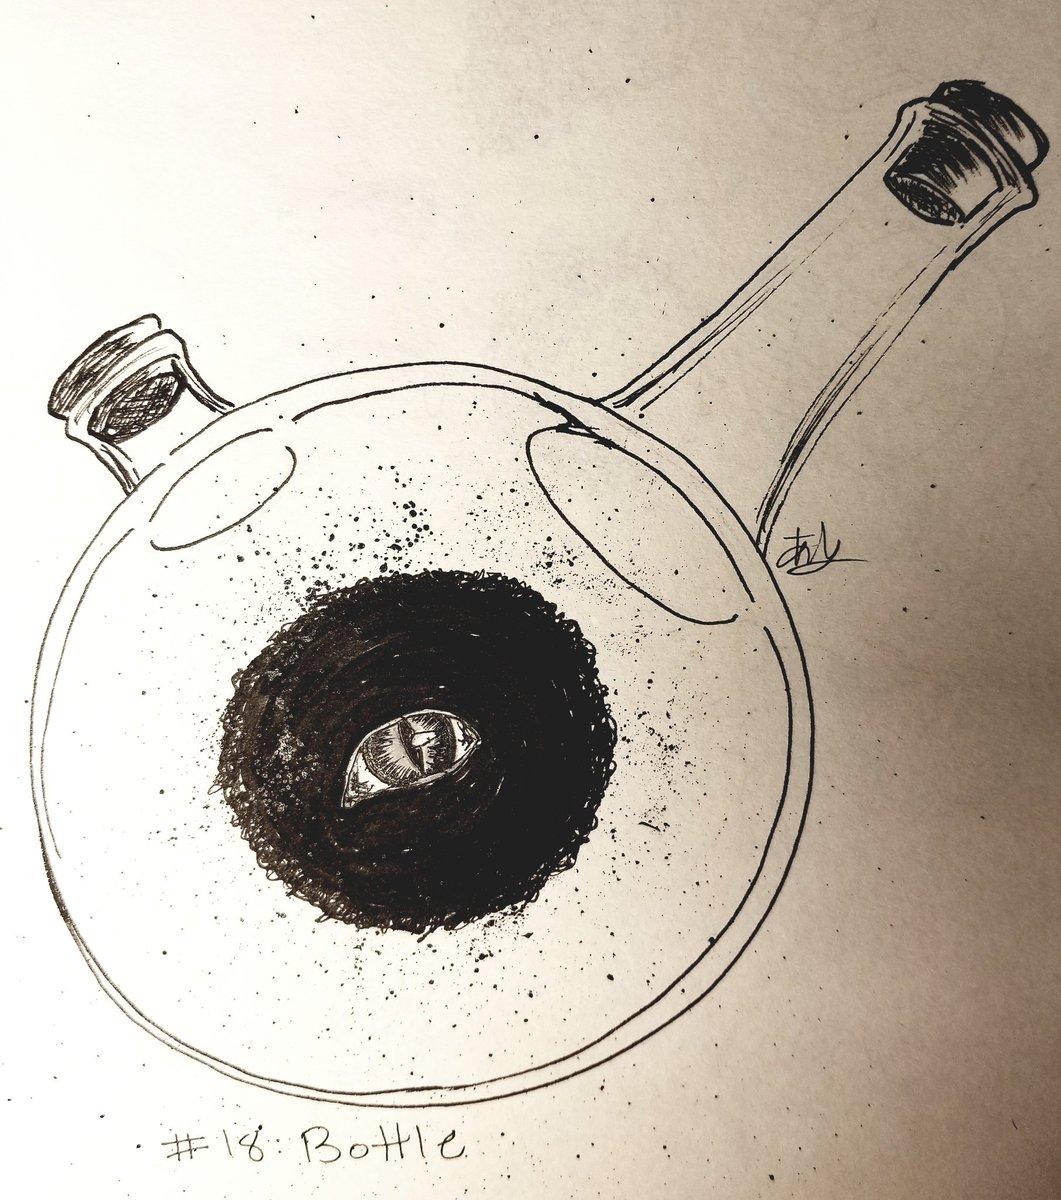 Inktober #18: Bottle  Dwarf in the Flask.  #inktober #inktober2018 #FMA #はがれん #鋼の錬金術師